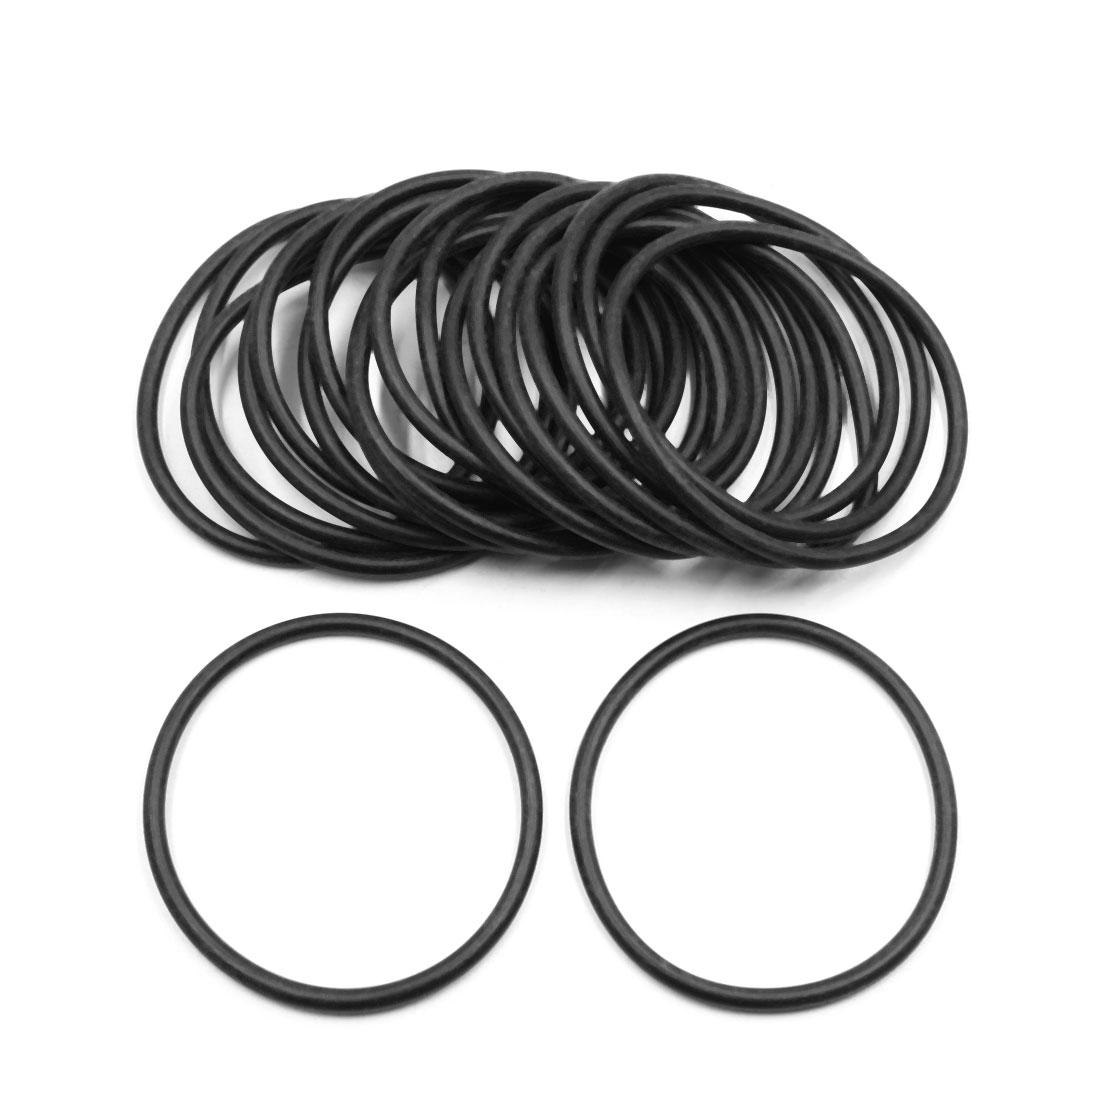 20pcs Black Universal Nitrile Rubber O-Ring Seals Gasket for Car 60 x 3.55mm